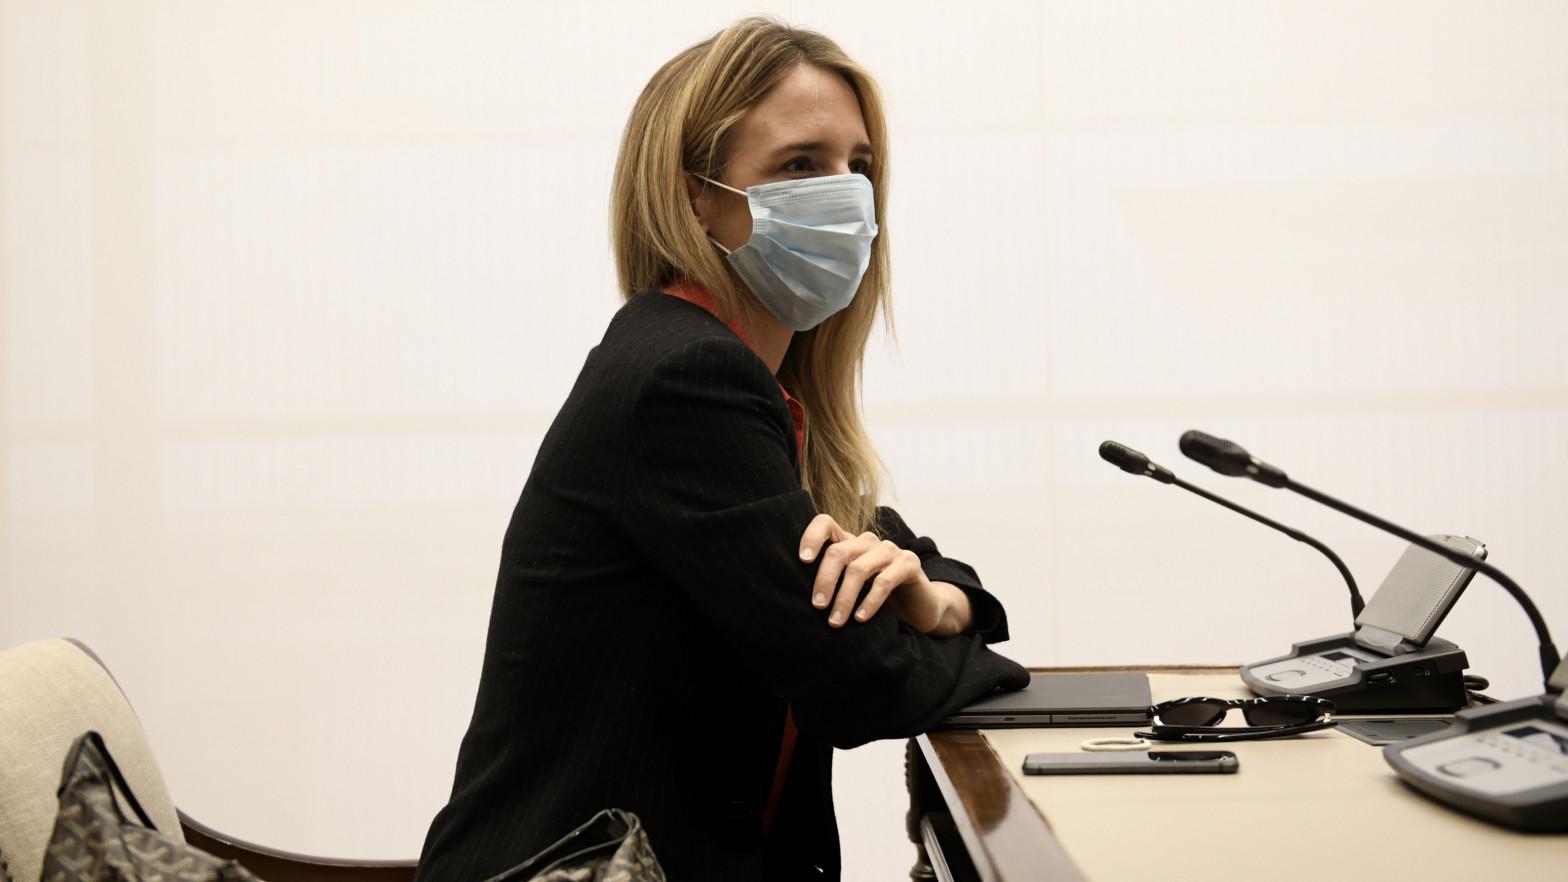 Cayetana Álvarez de Toledo felicita a Vox e insta a Llop a rectificar por su ataque a la Justicia.